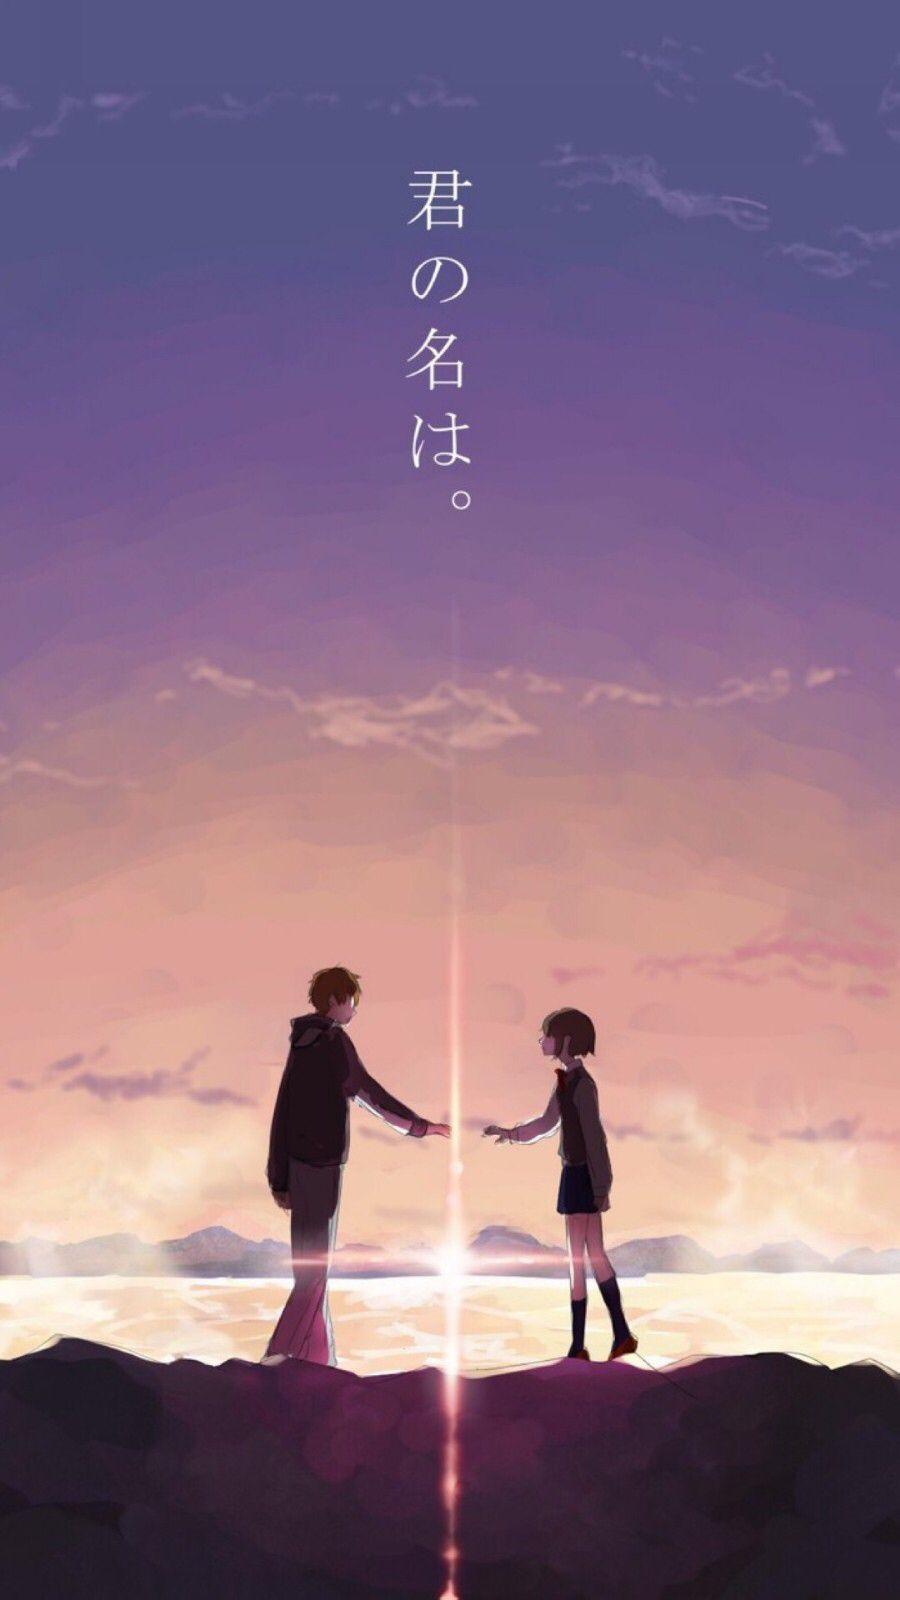 Live Wallpaper Filmes De Anime Kimi No Na Wa Animes Wallpapers